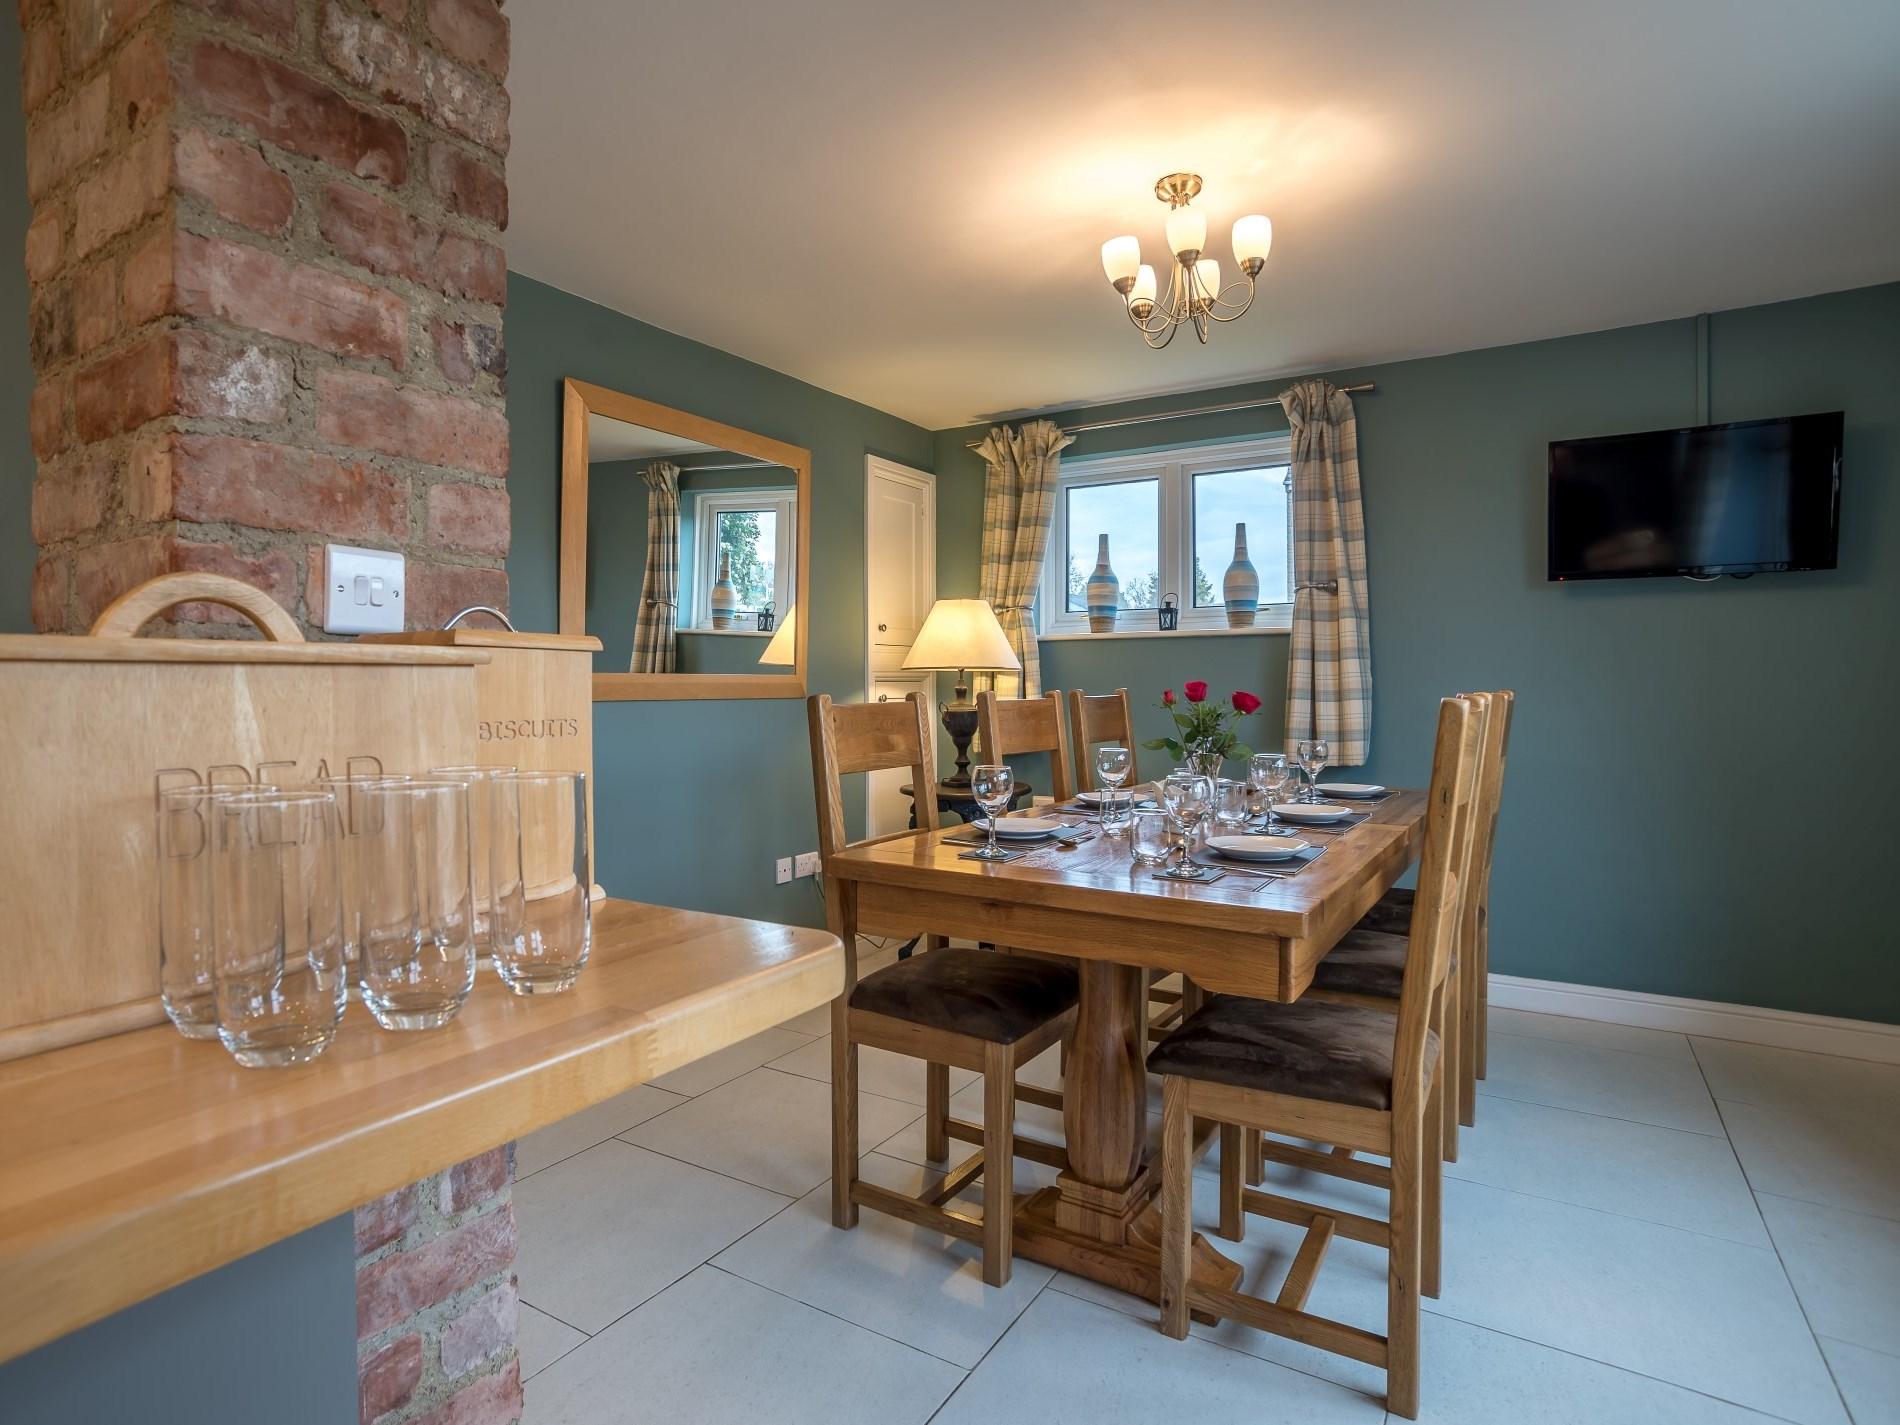 3 Bedroom Bungalow in Gloucestershire, Heart of England